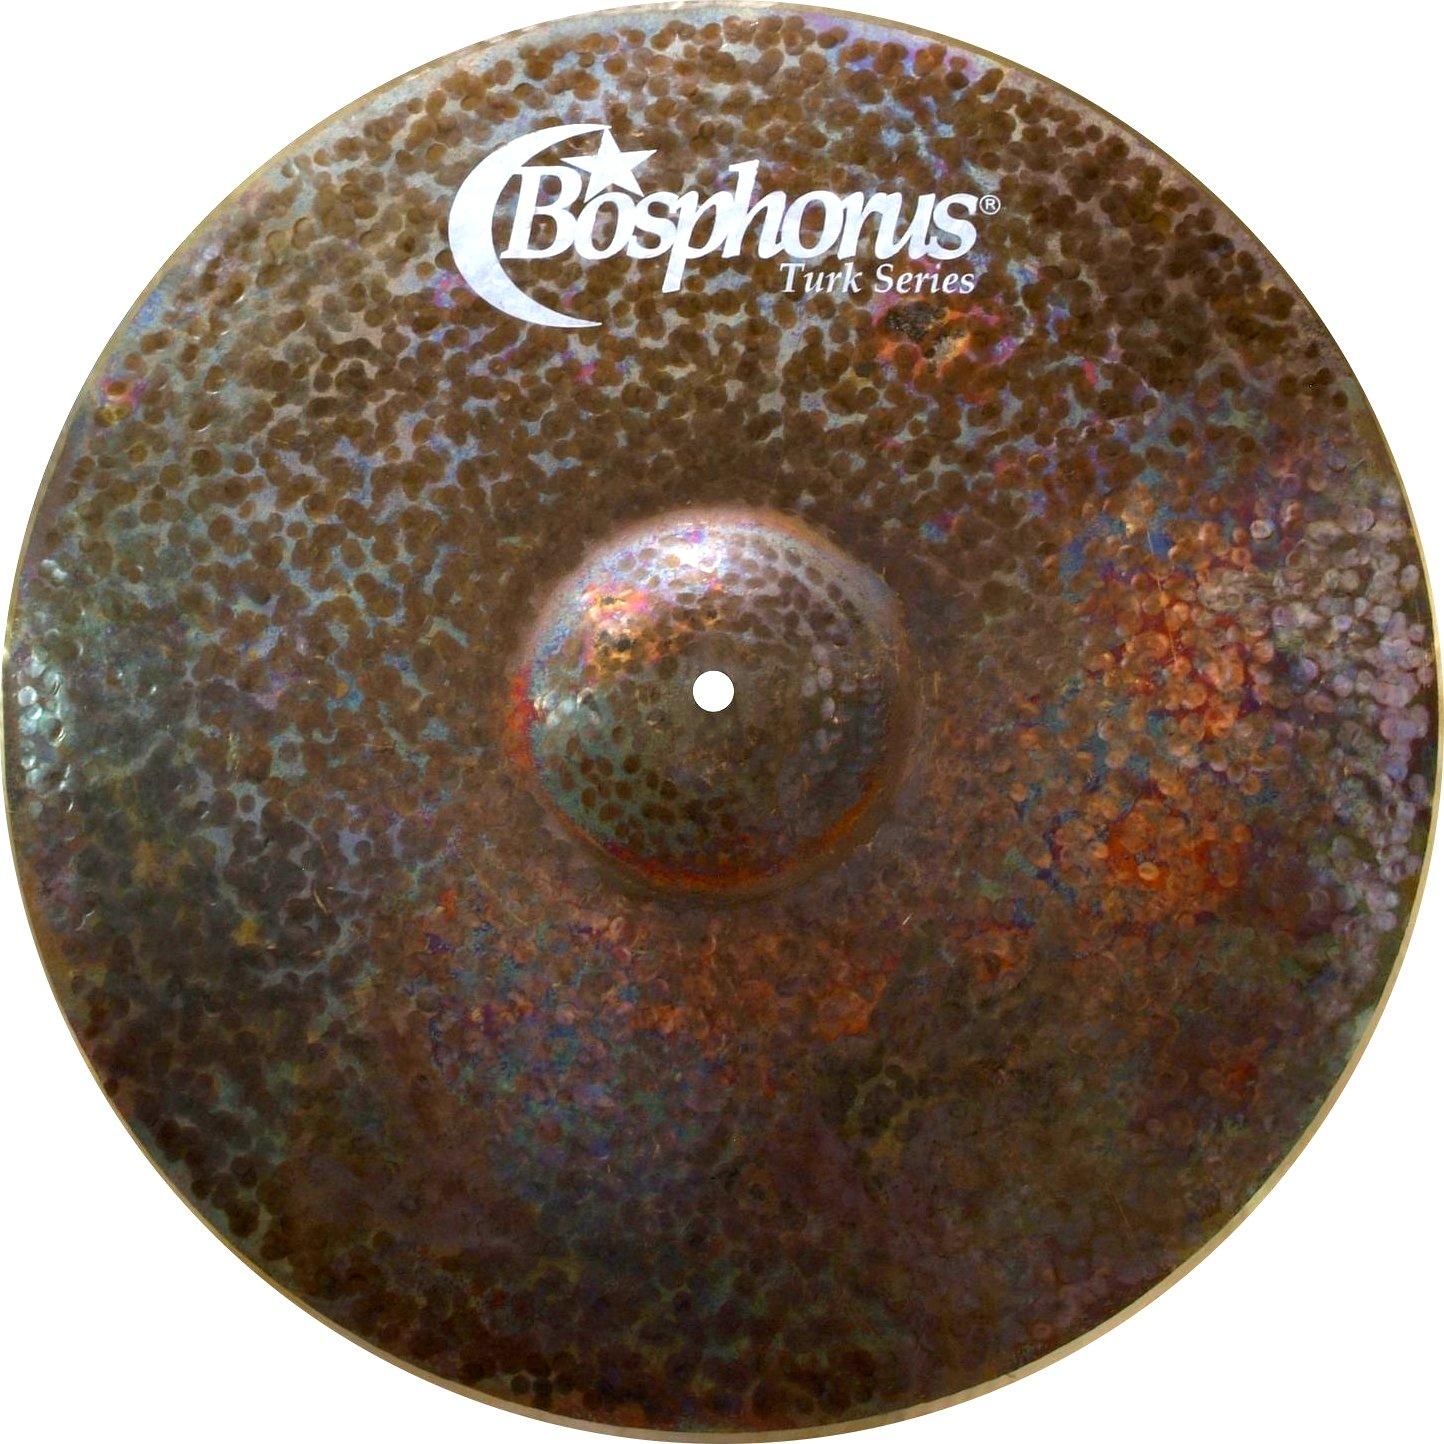 Bosphorus Cymbals K22RM 22-Inch Turk Series Ride Cymbal